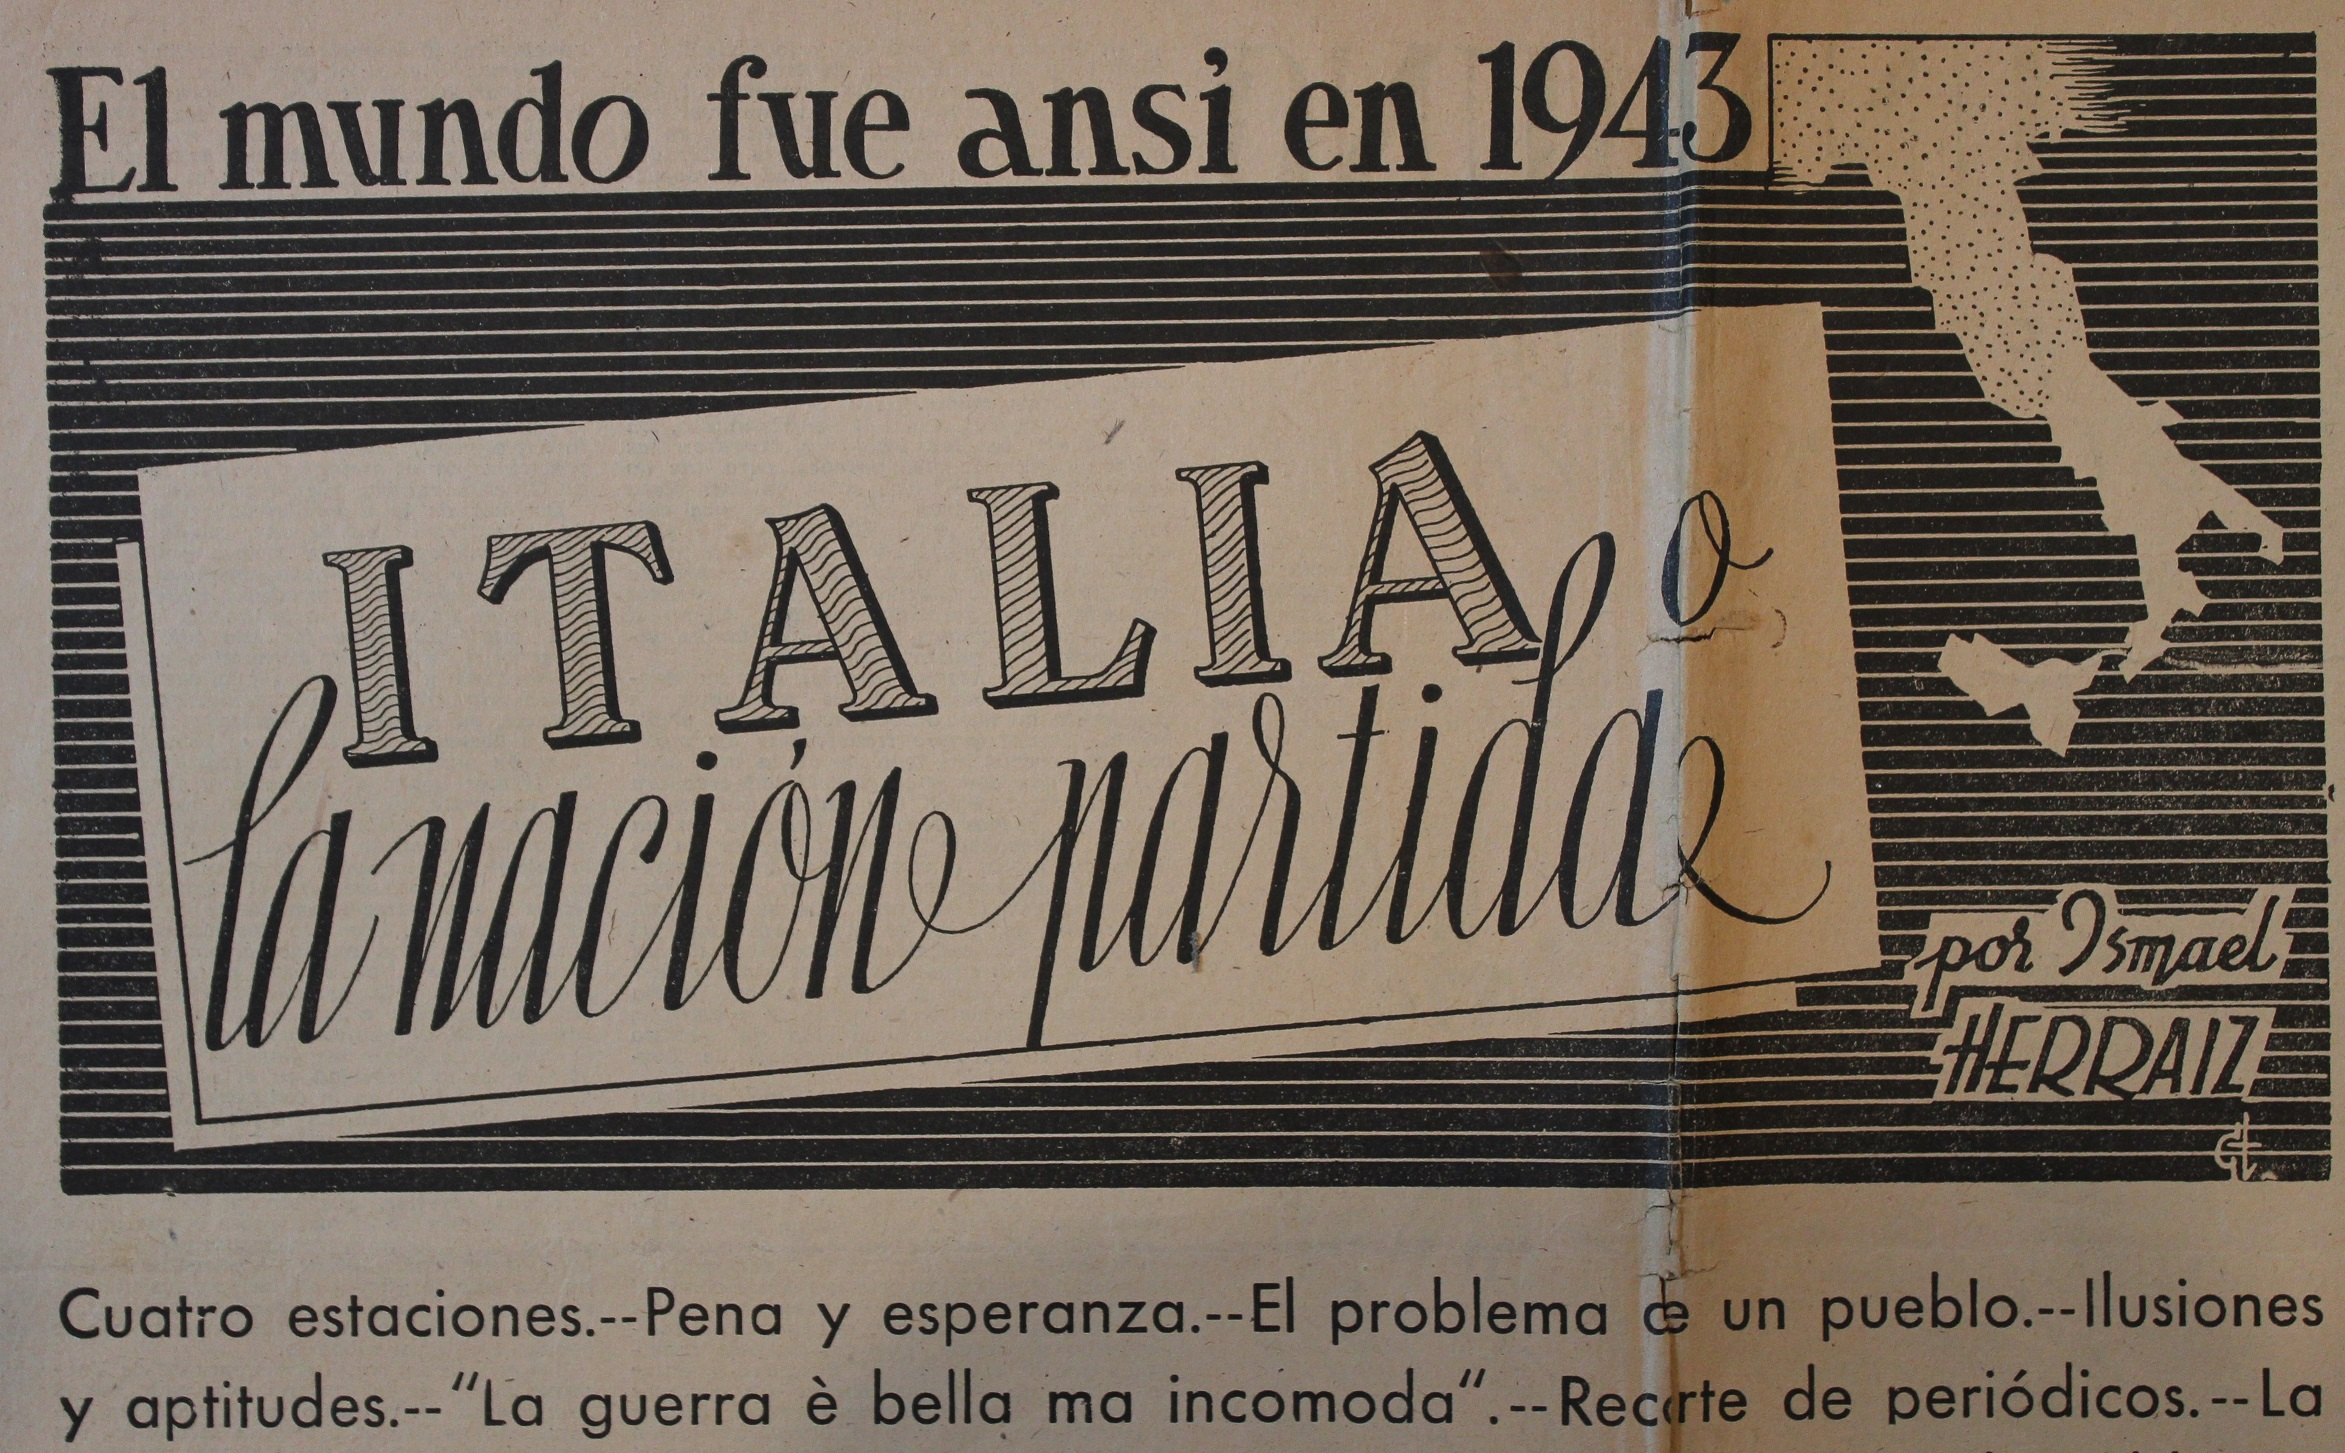 DECIMA FLOTTIGLIA M.A.S.: propaganda per la riscossa (XIV parte) – Gianluca Padovan